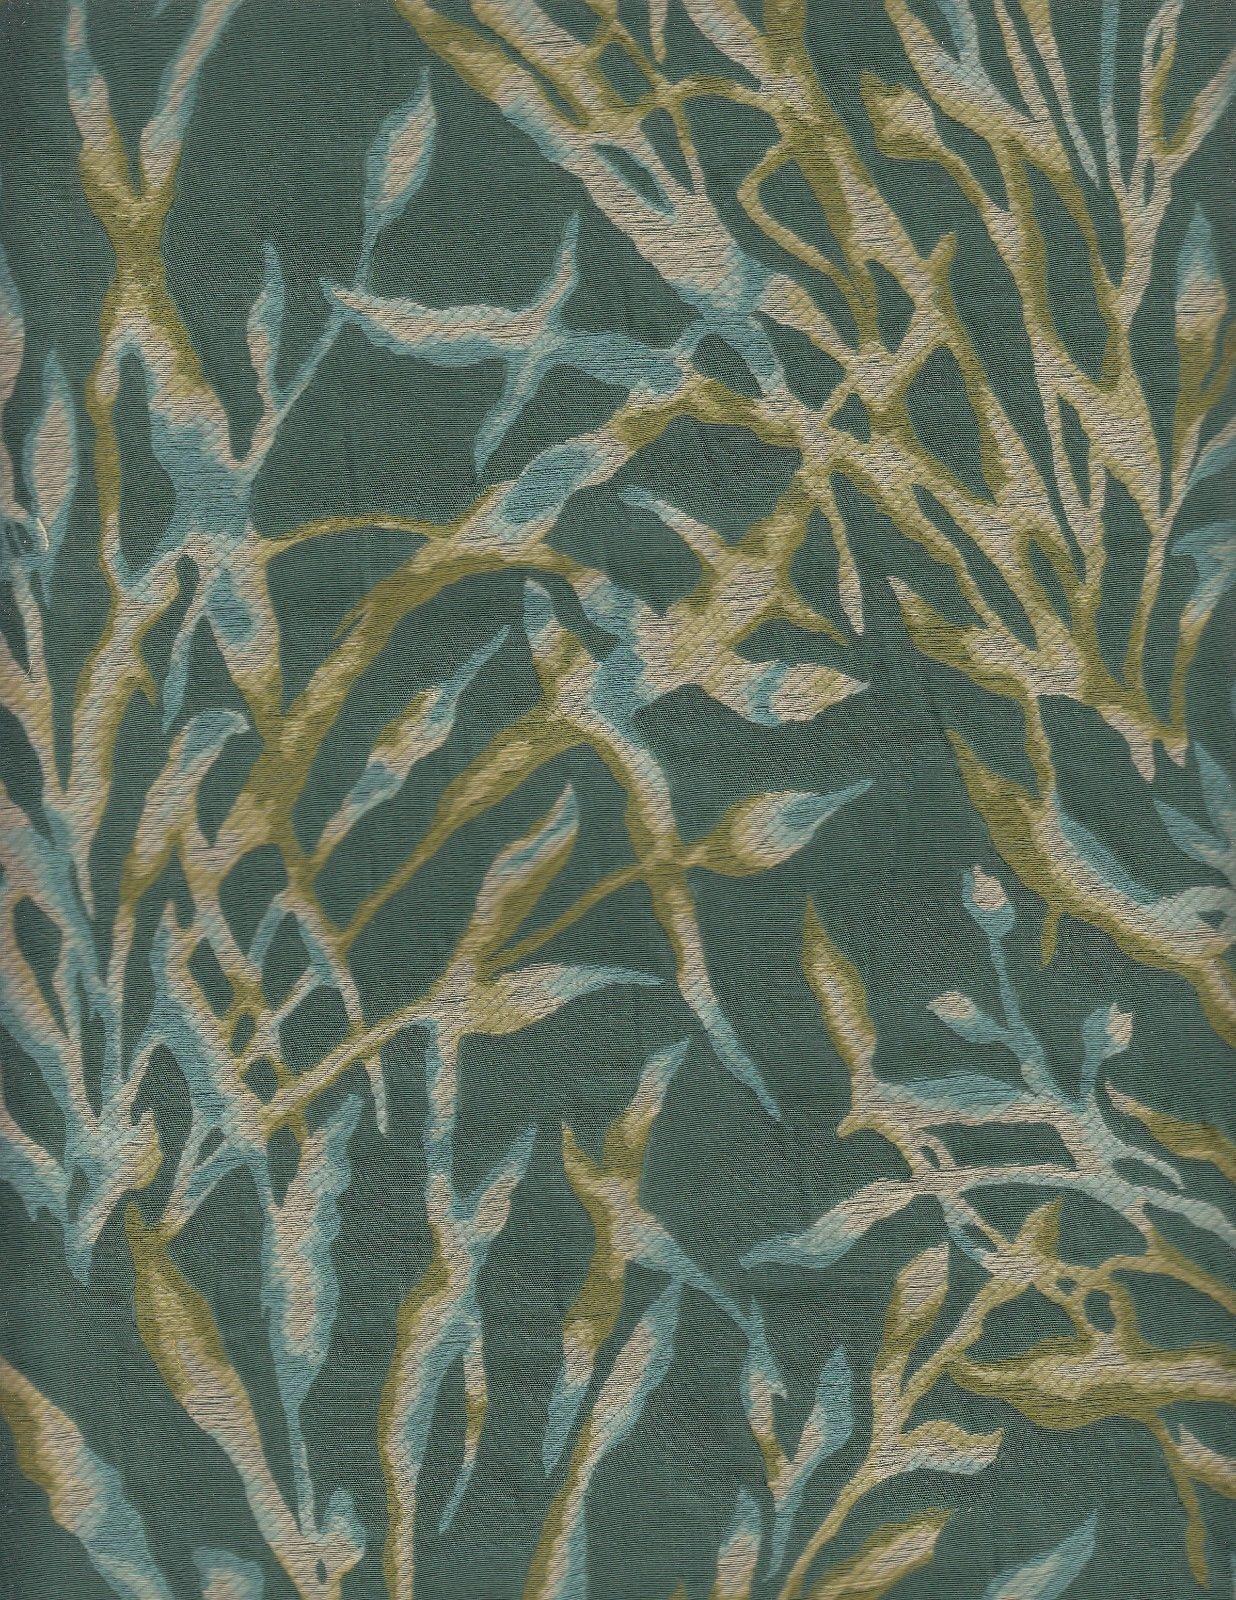 2.5 yds Donghia Upholstery Fabric Nemo Botanical Seaweed Green 10080-40 PZ6